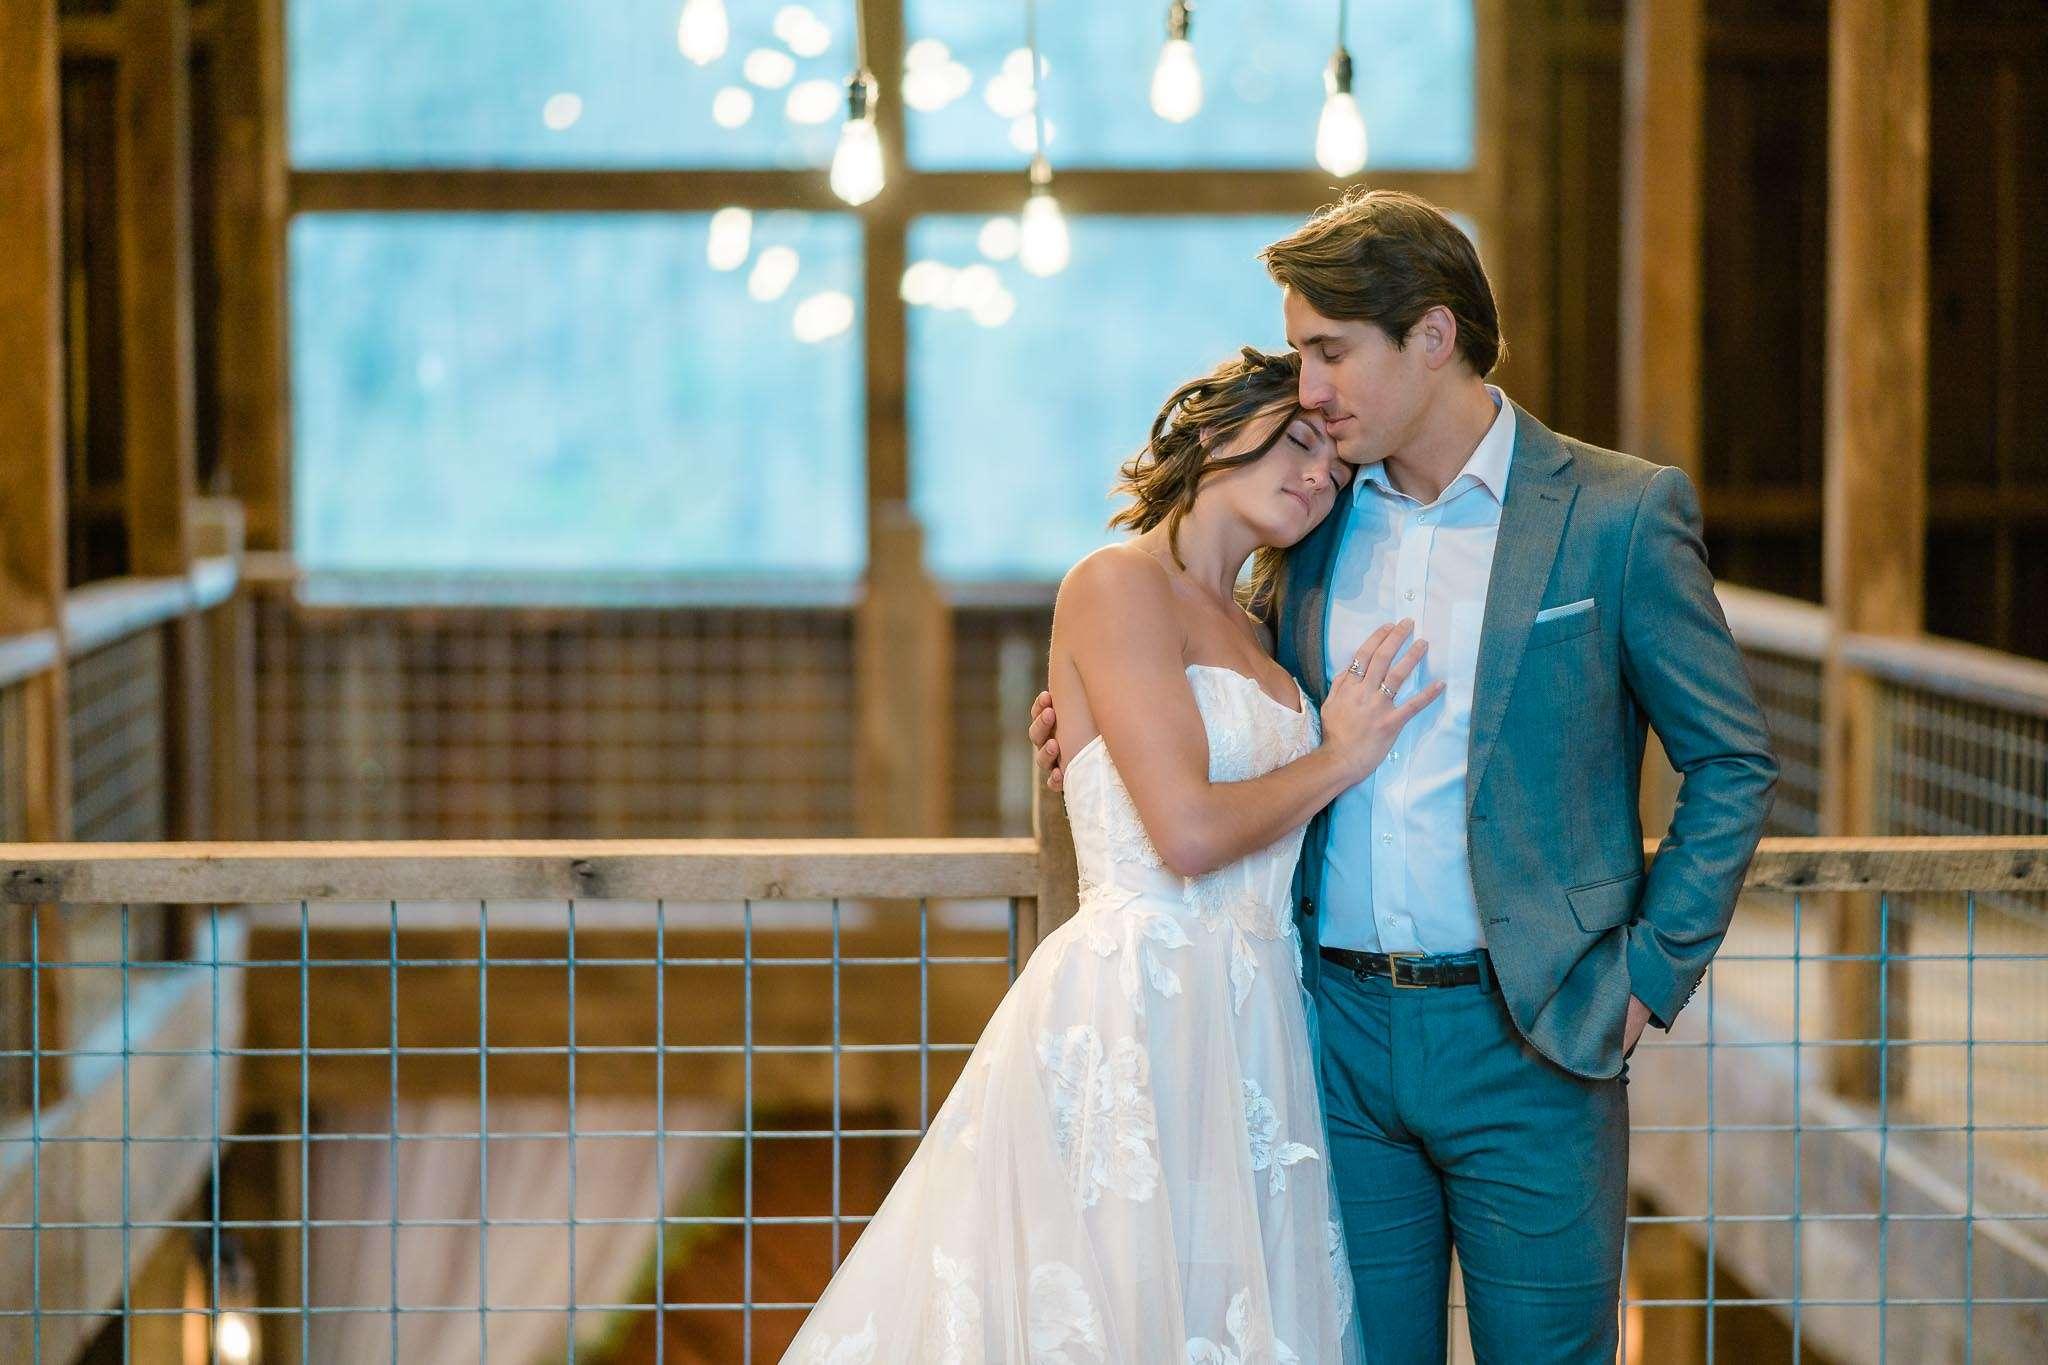 Hopkinsville, KY Wedding Photographer - Keepsake Wedding Photography